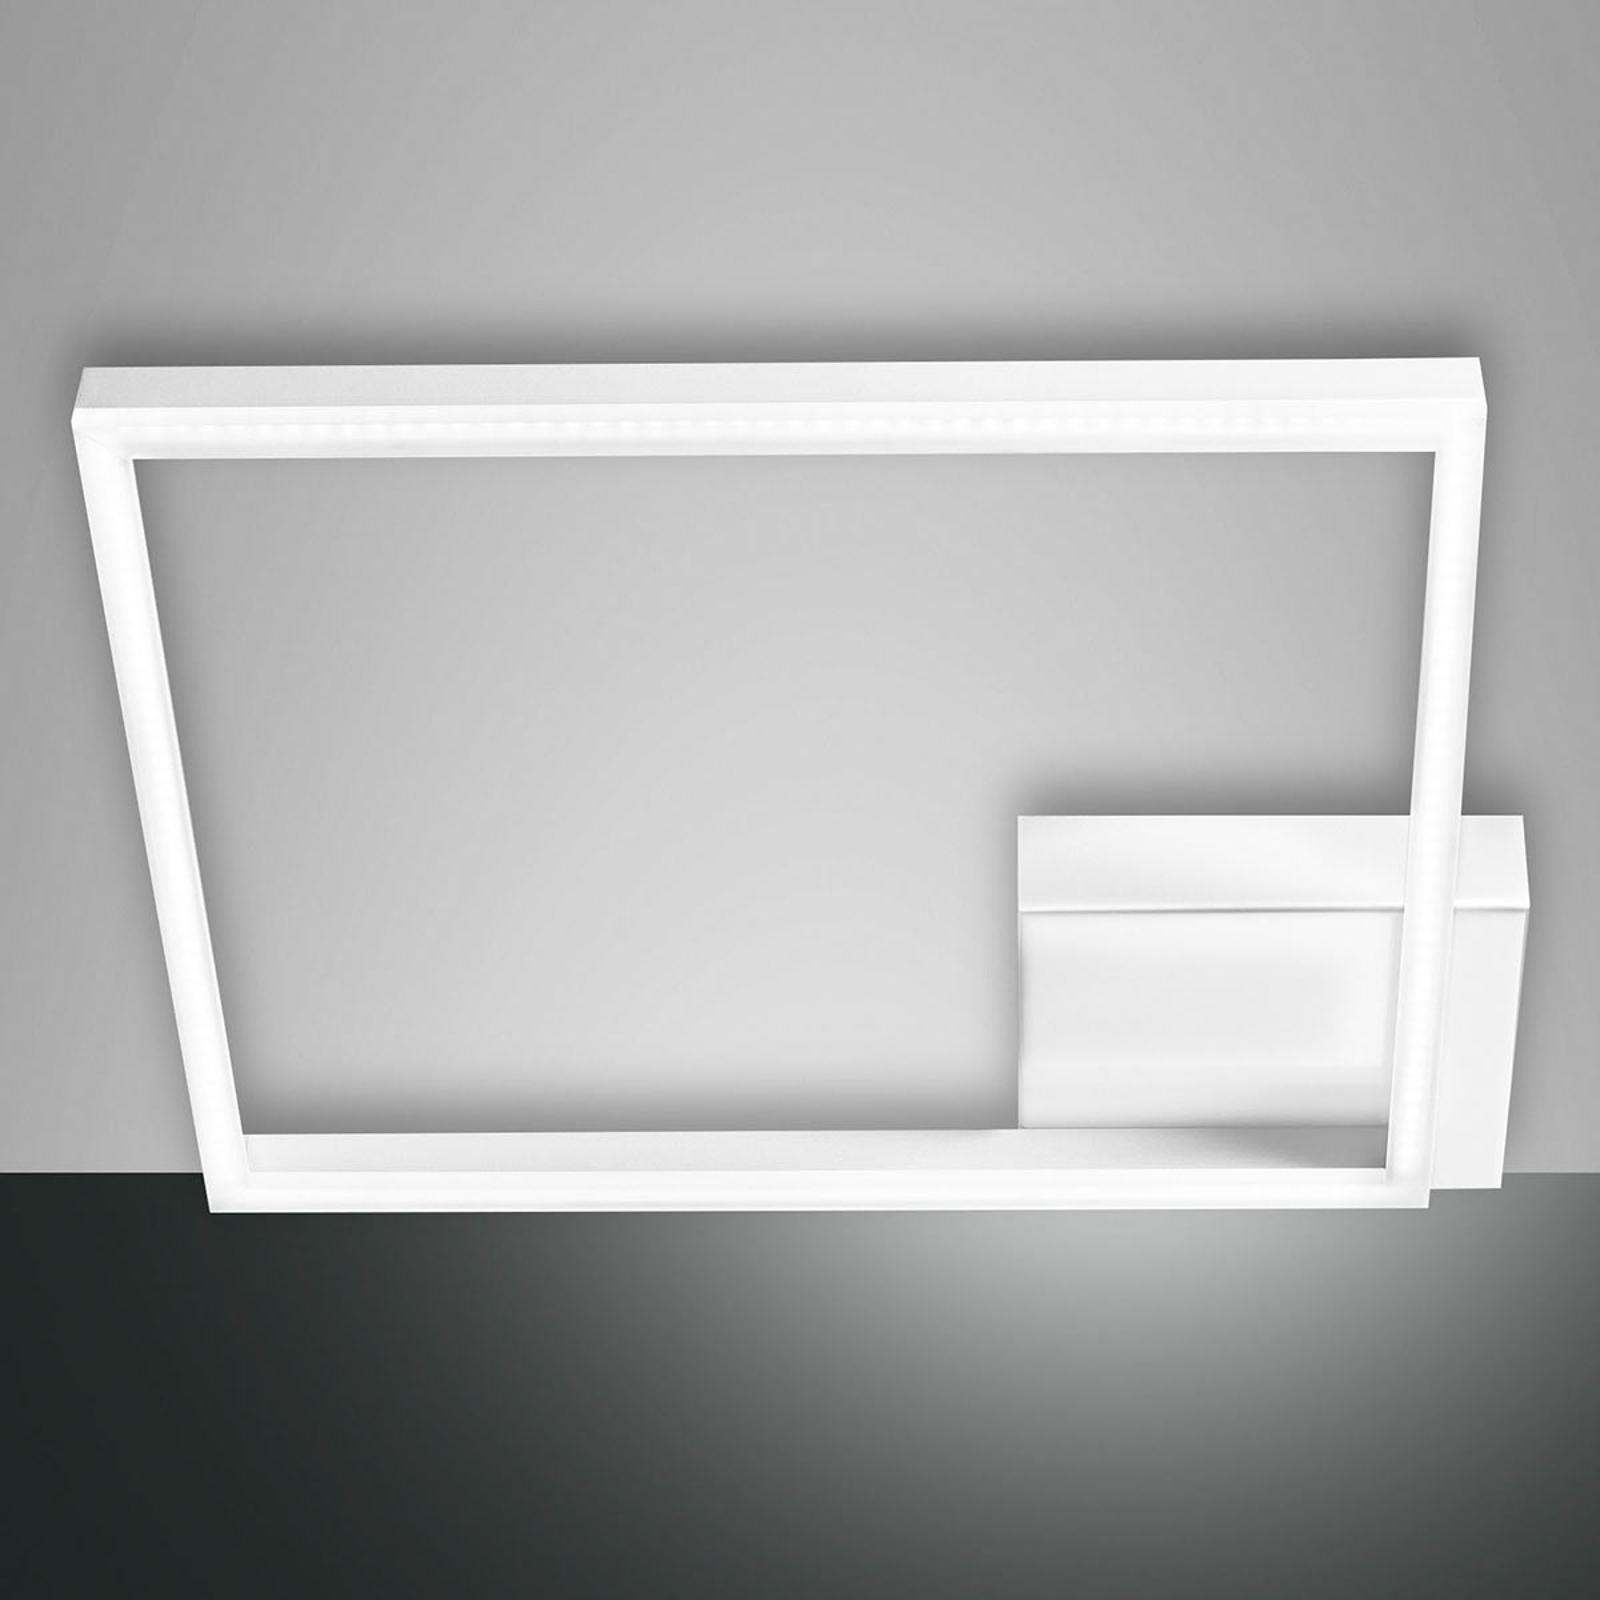 Vierkante LED plafondlamp Bard met één lampje